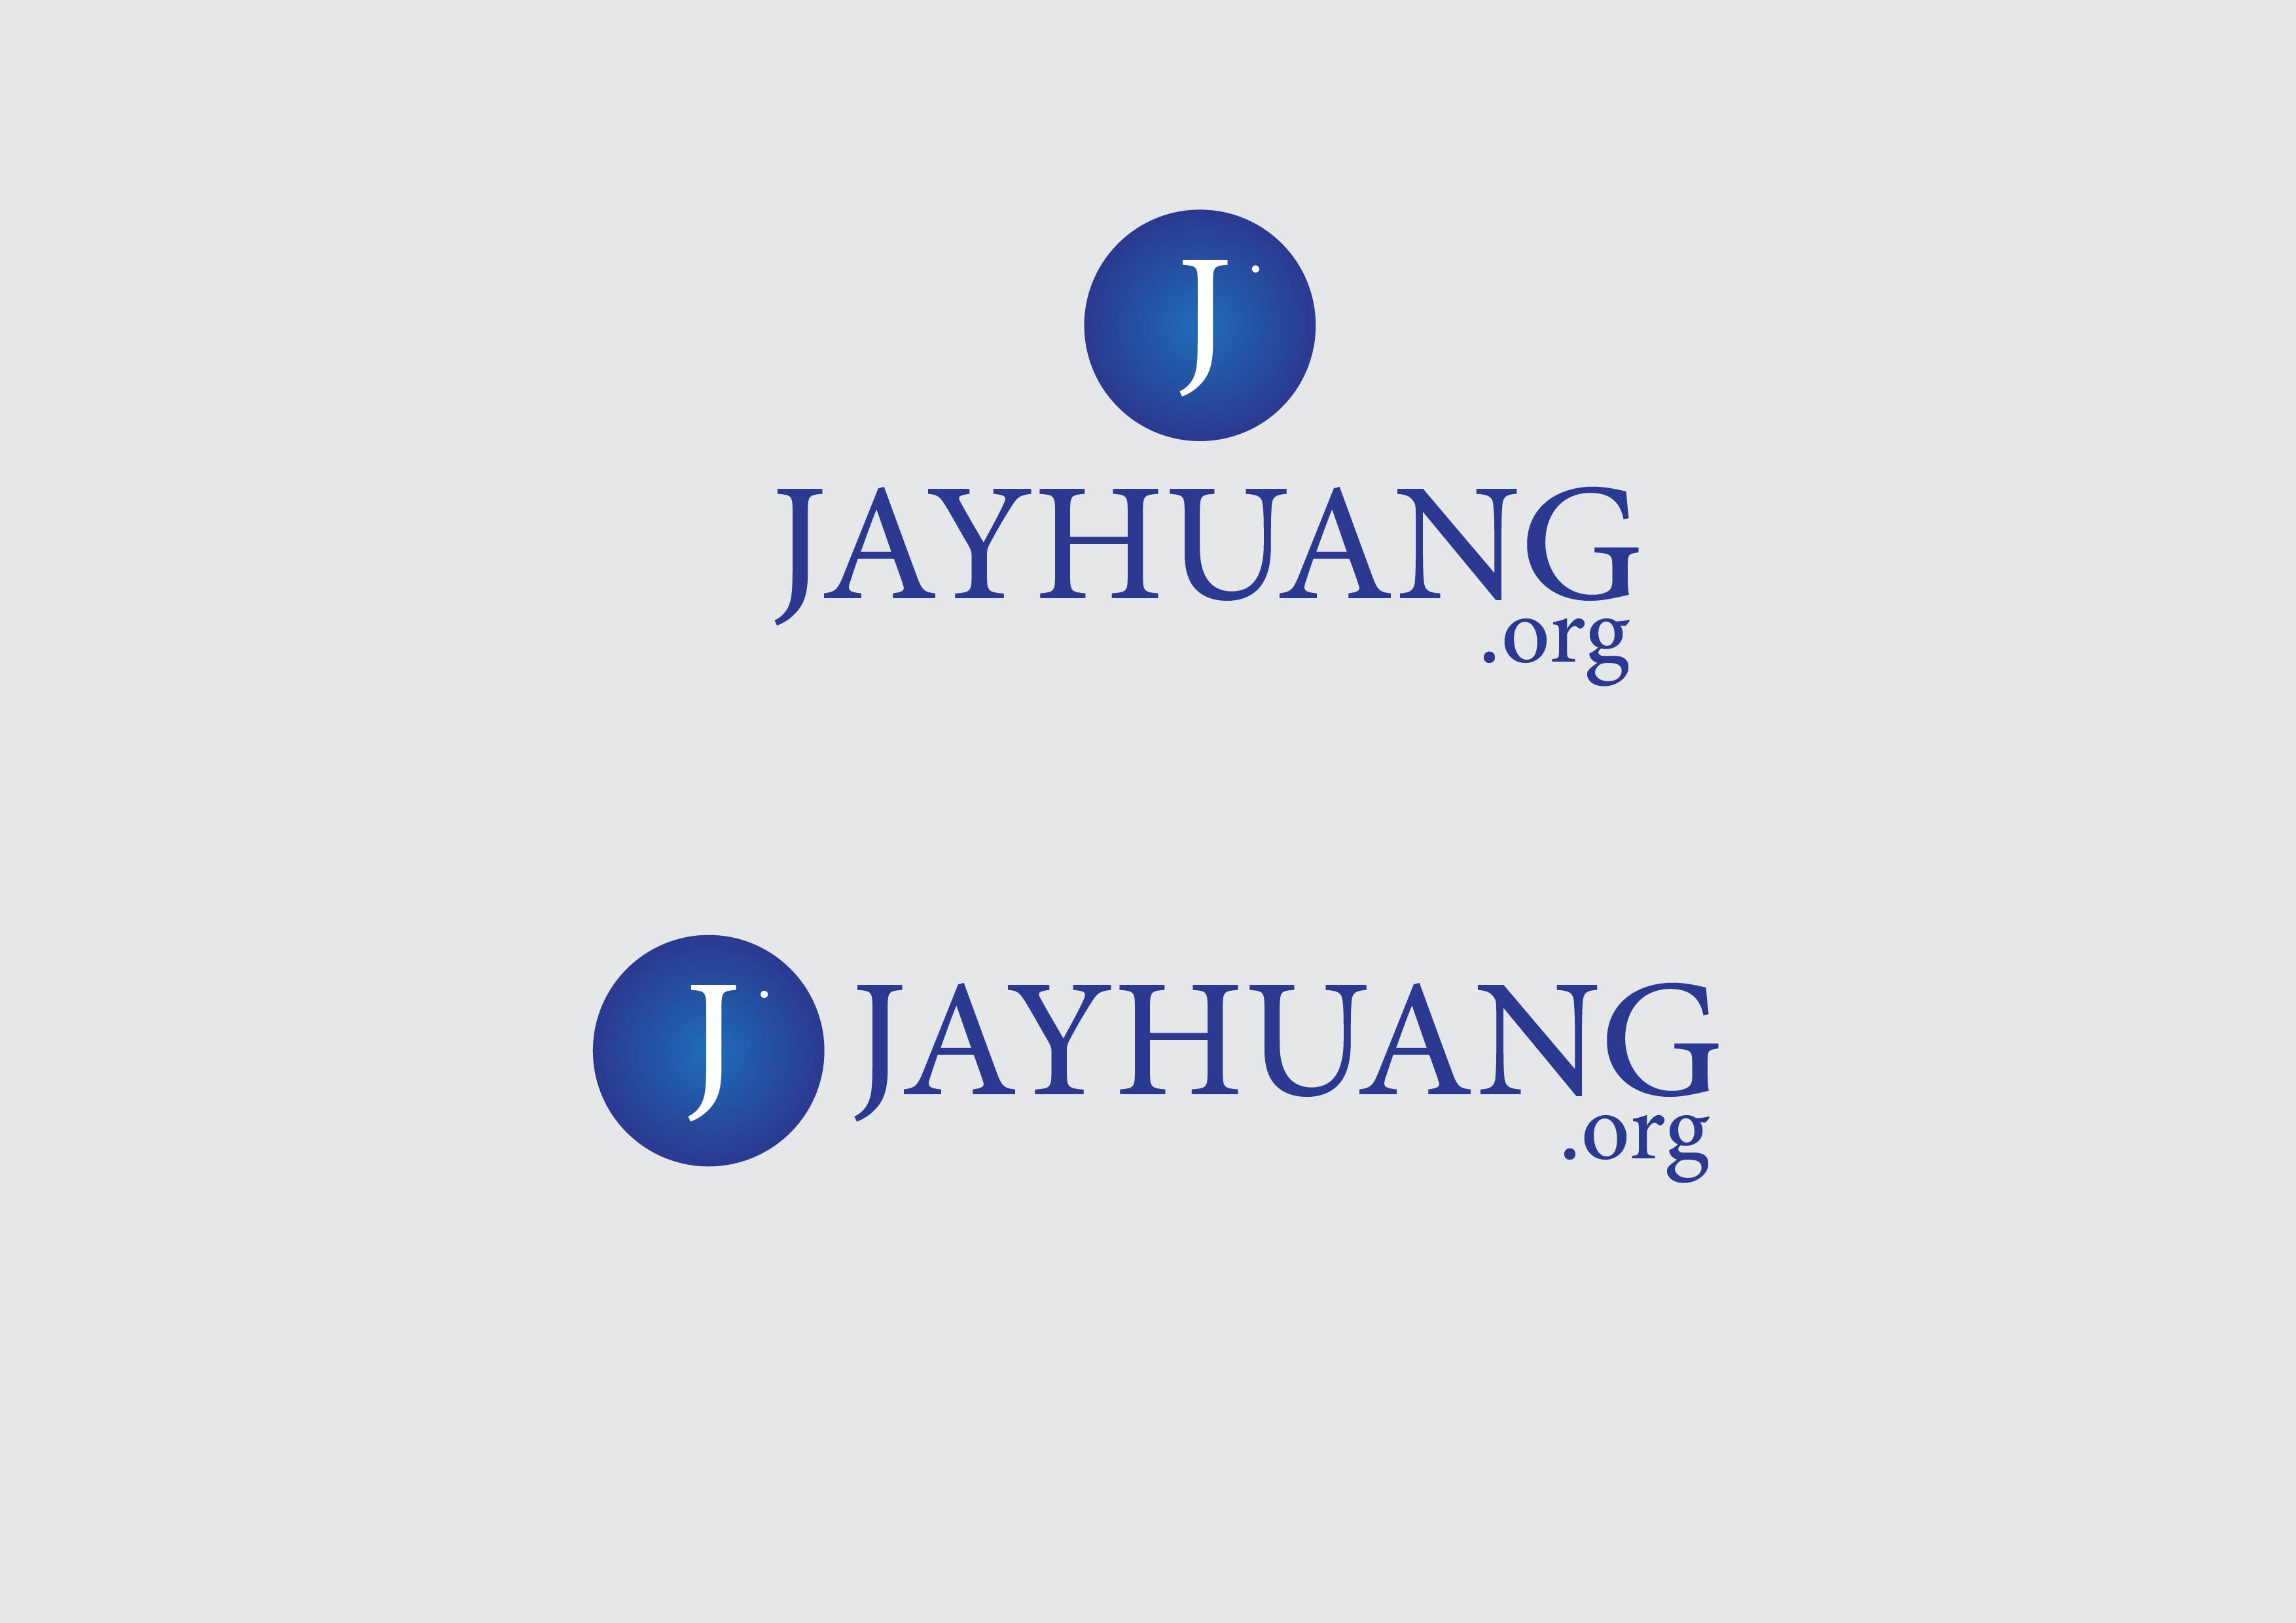 Logo Design by 3draw - Entry No. 11 in the Logo Design Contest Creative Logo Design for website.